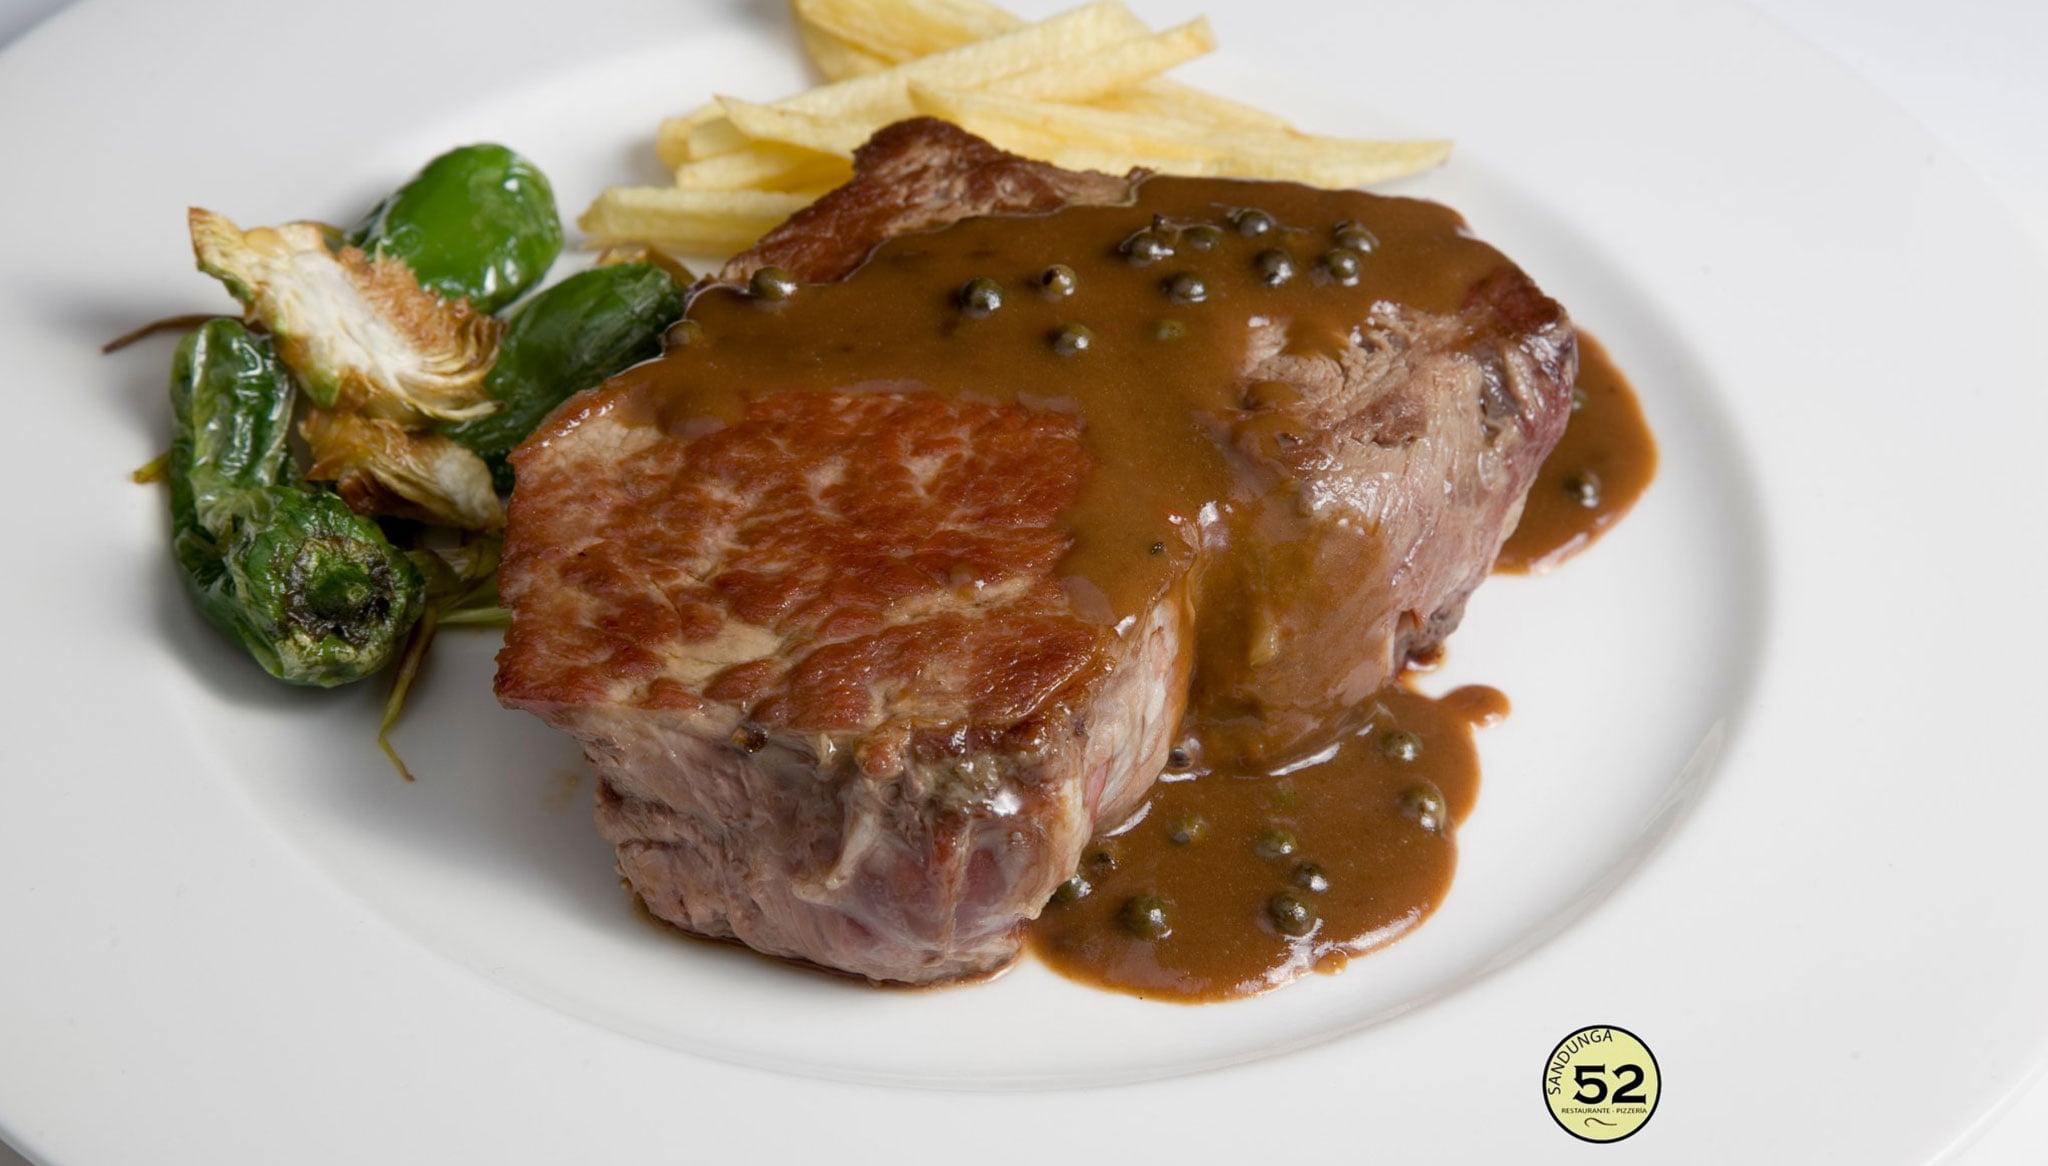 Sabroso plato de carne – Sandunga 52